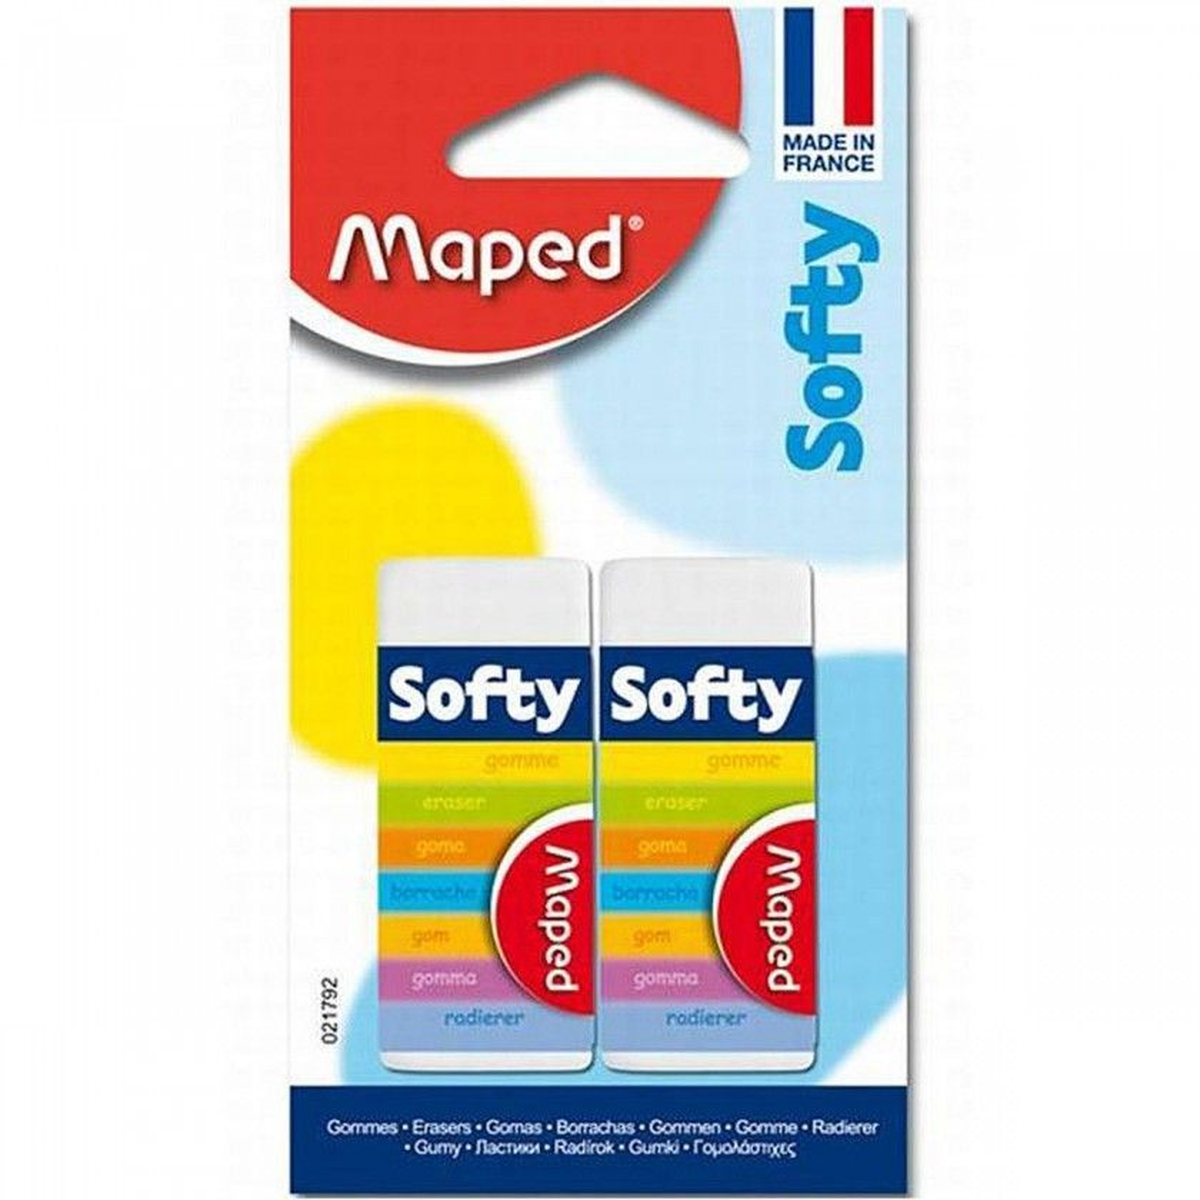 Maped - Lot de 2 Gommes Softy sous Blister